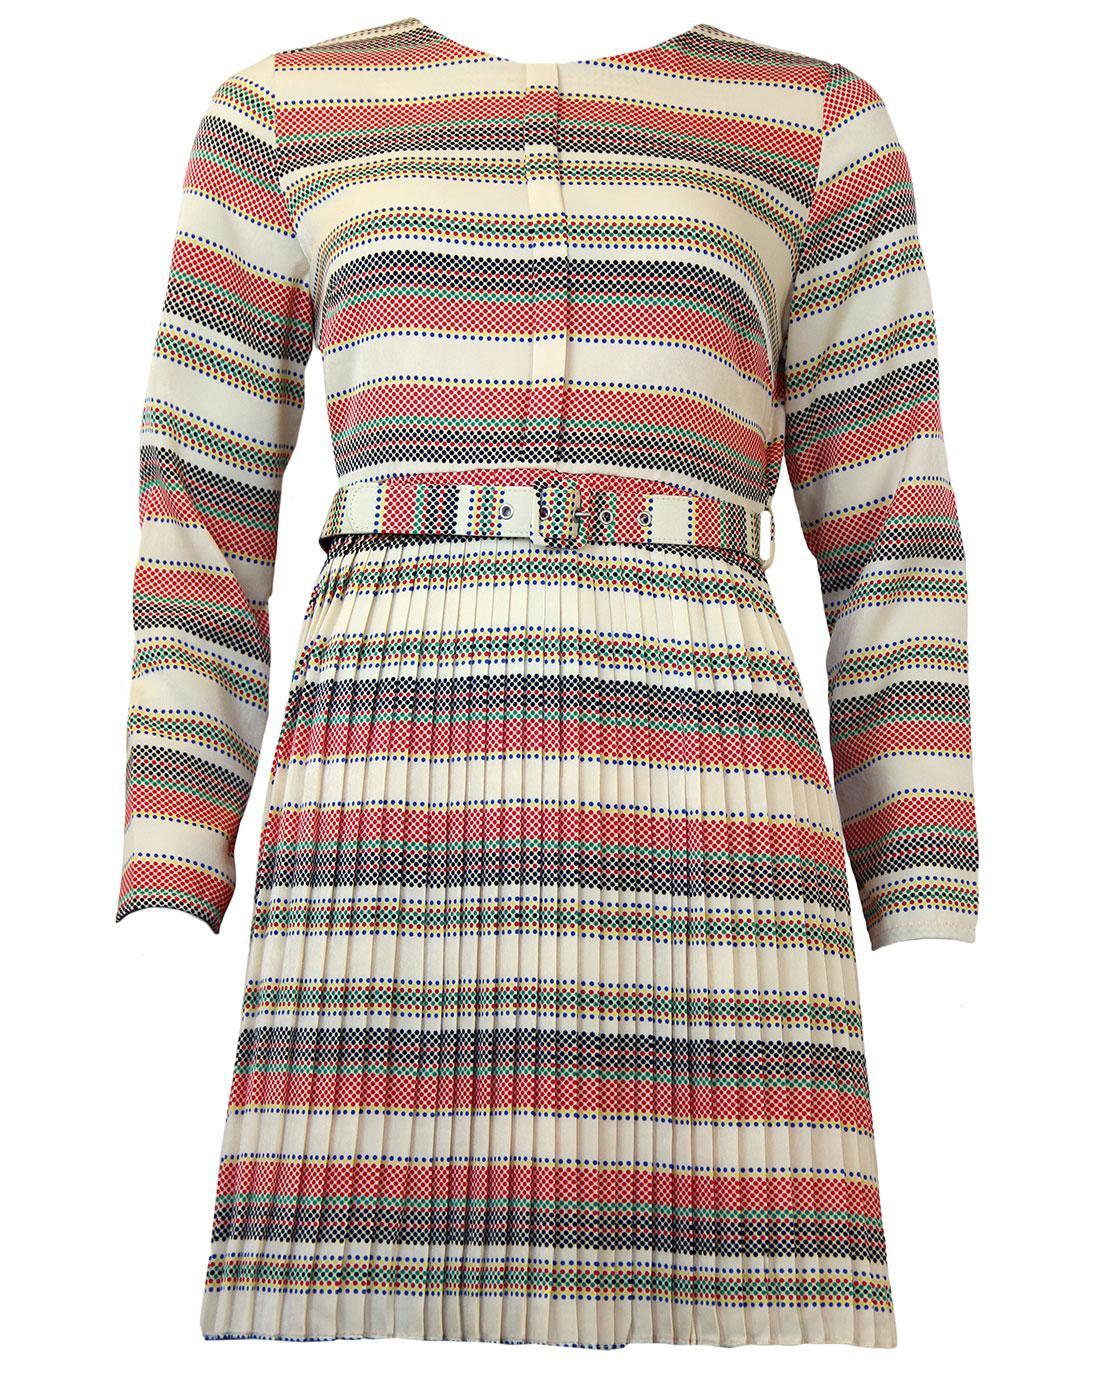 Ashleigh DARLING Retro 70s Polka Dot Dress